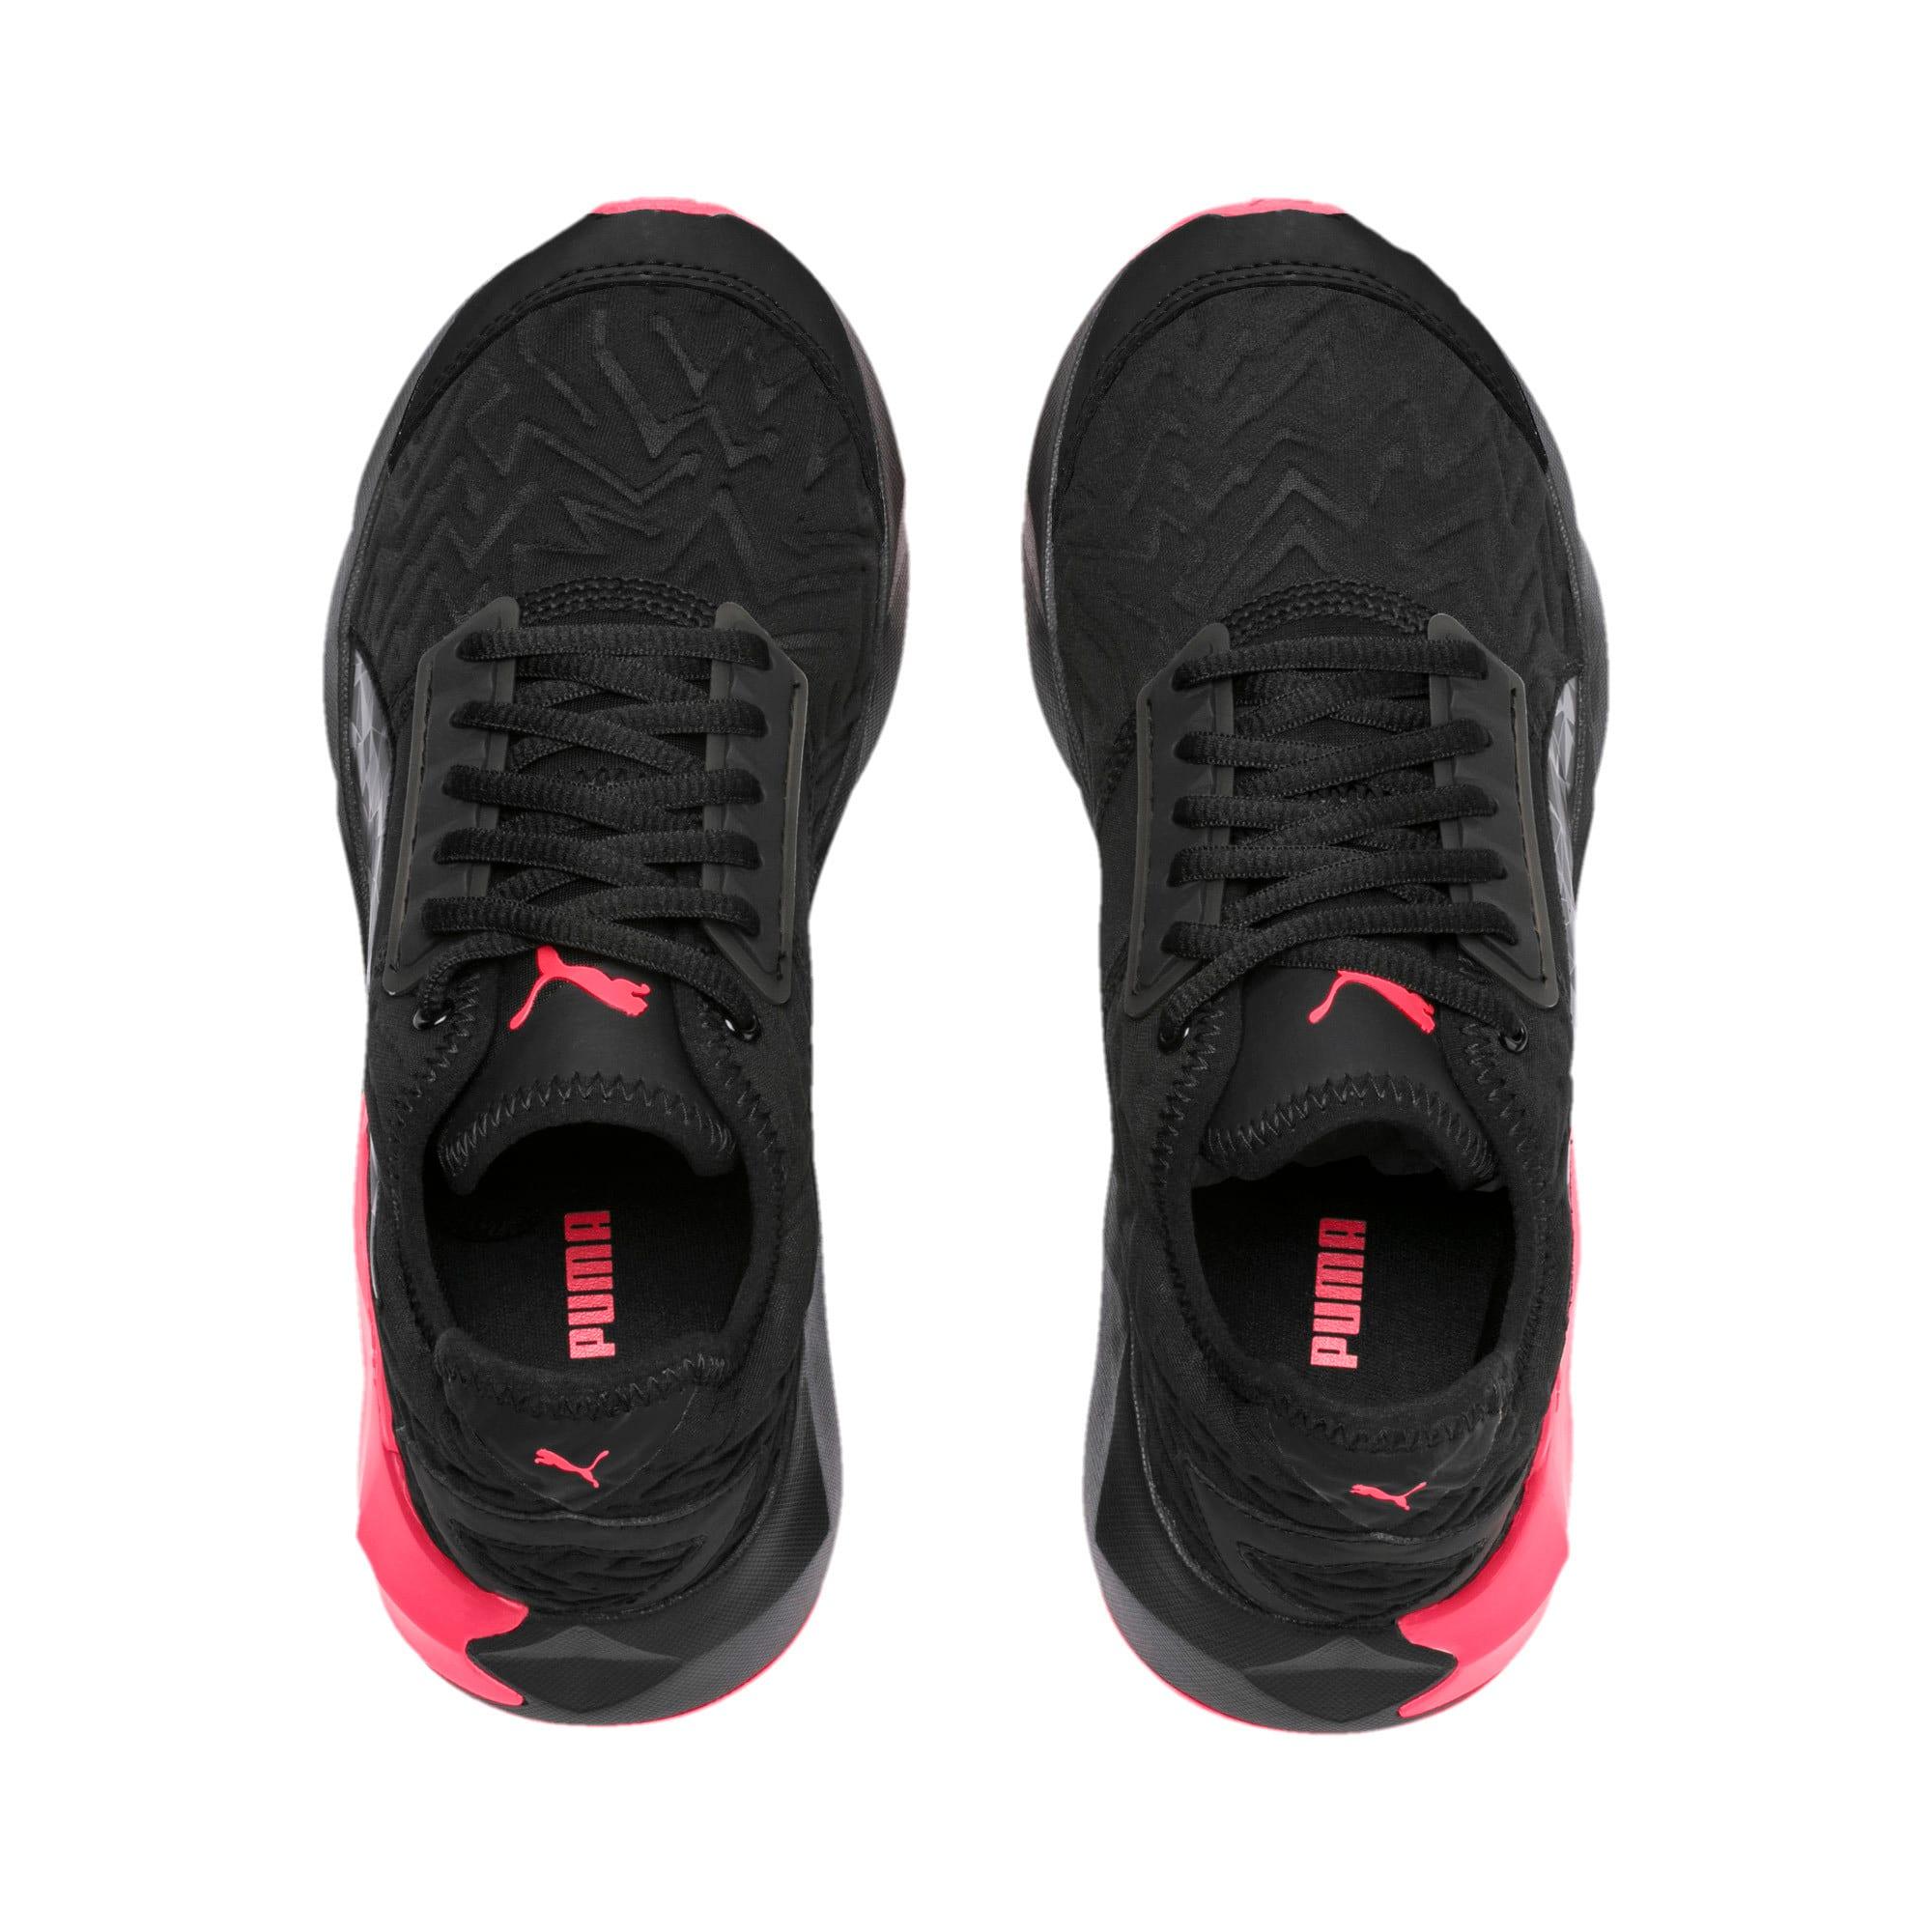 Thumbnail 6 of CELL Plasmic Fluorescent Women's Training Shoes, Puma Black-Pink Alert, medium